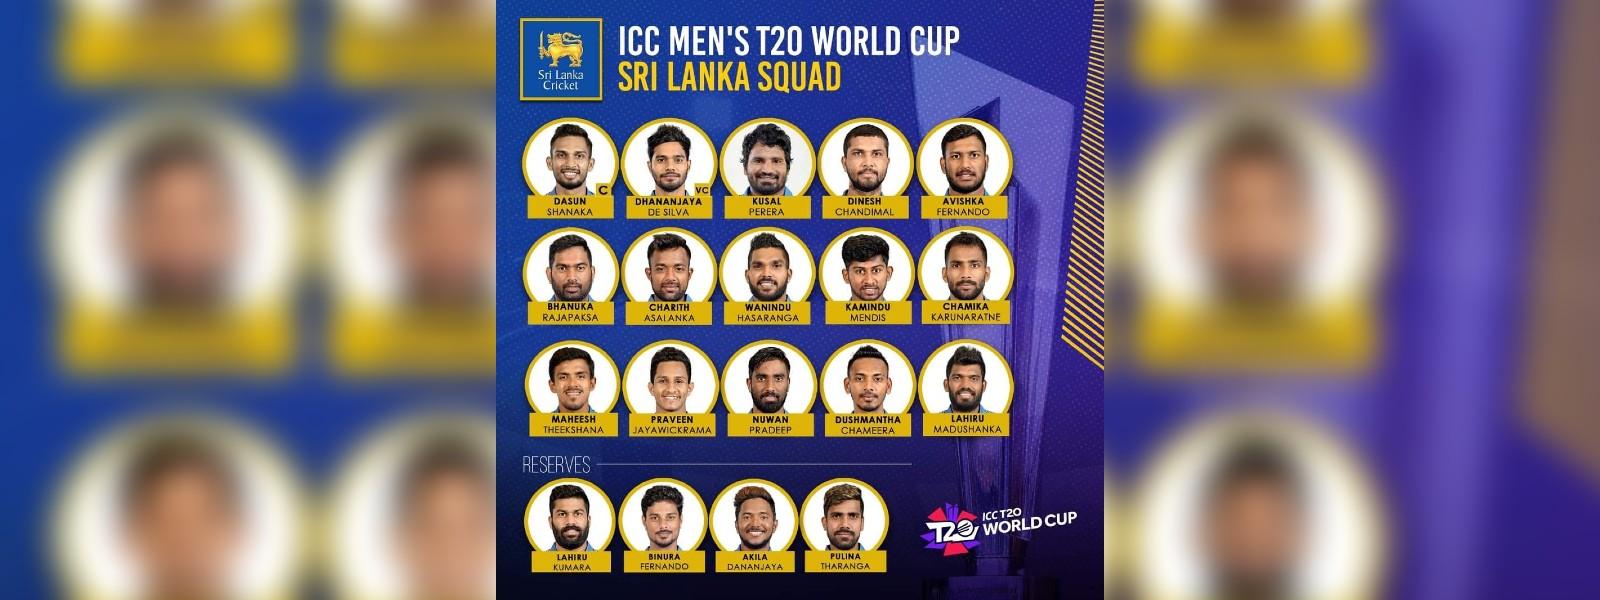 Sri Lanka squad for T20 WC announced